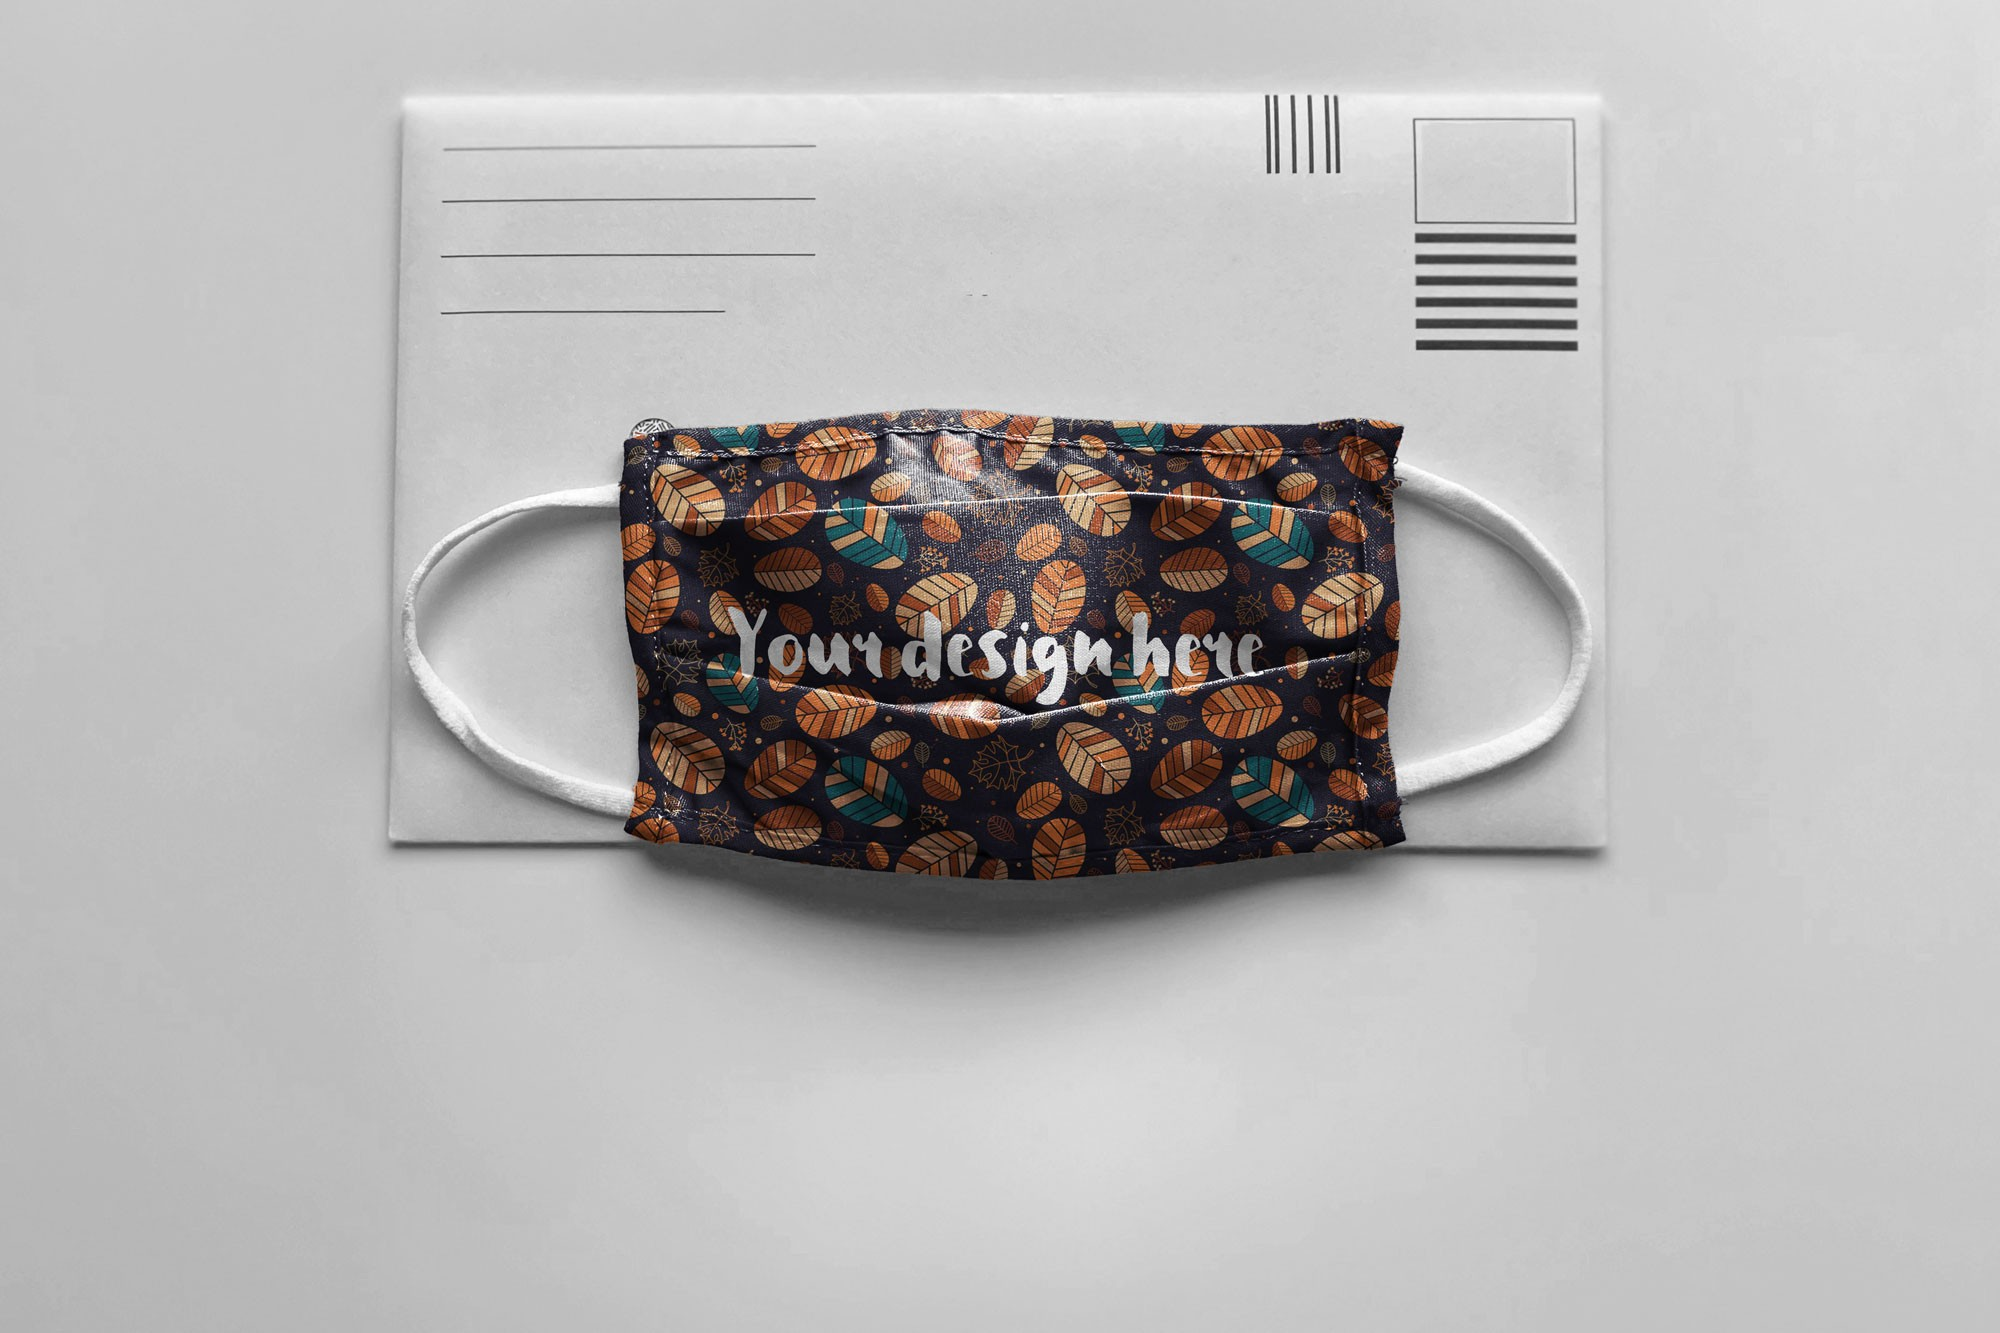 Face Mask on an Envelope